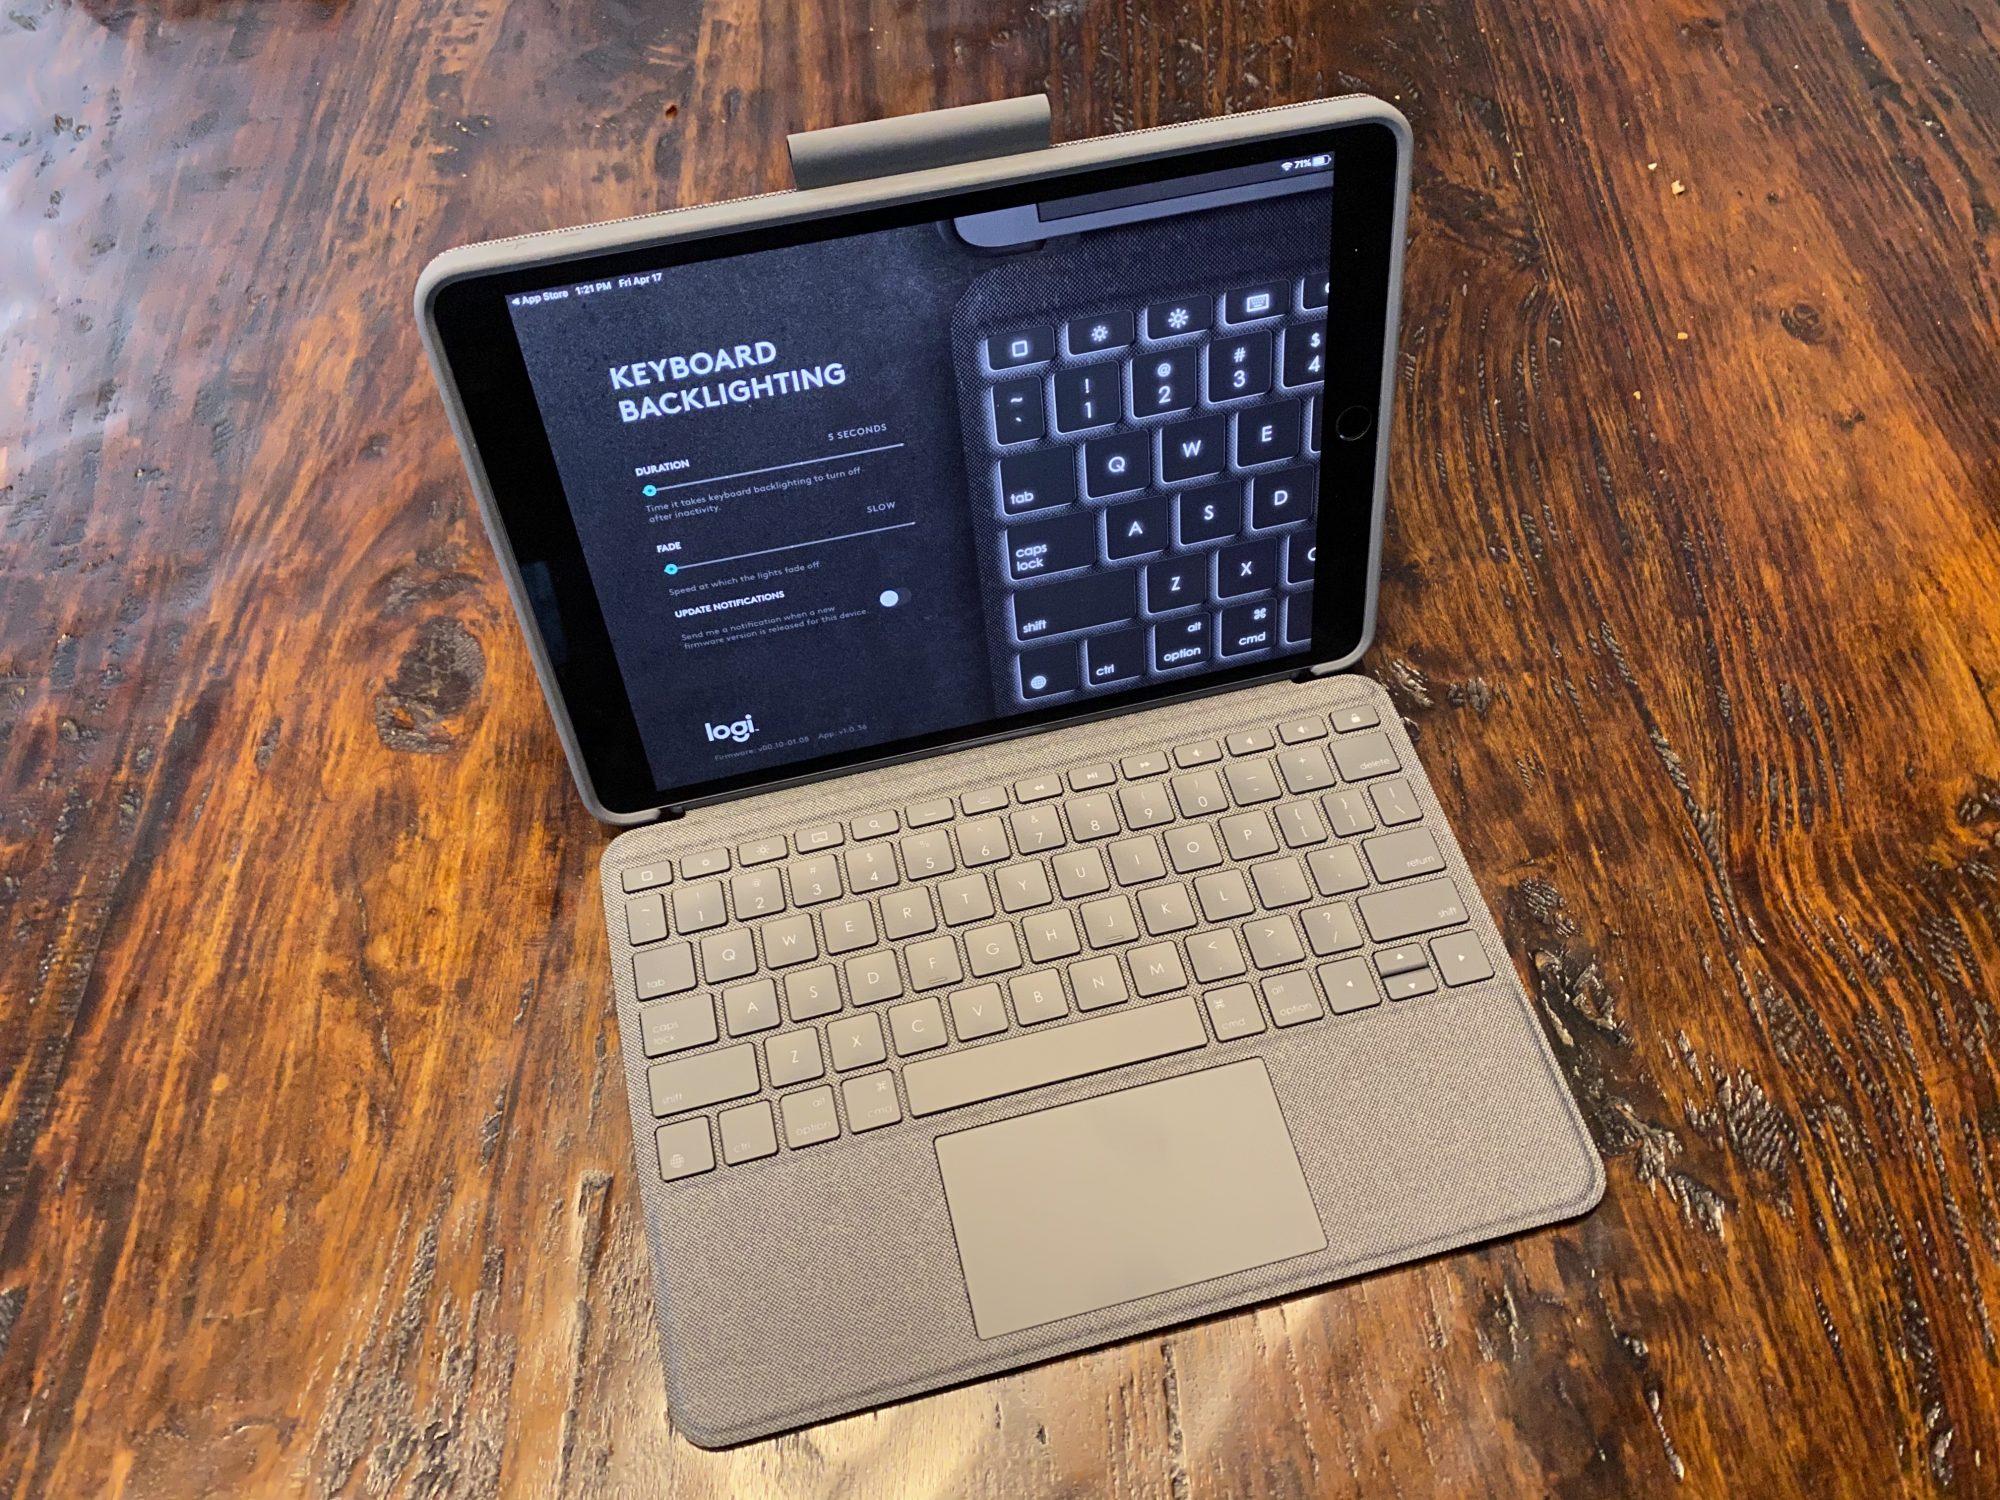 Hands-on: Logitech's iPad trackpad keyboards create $500 Apple laptops 3